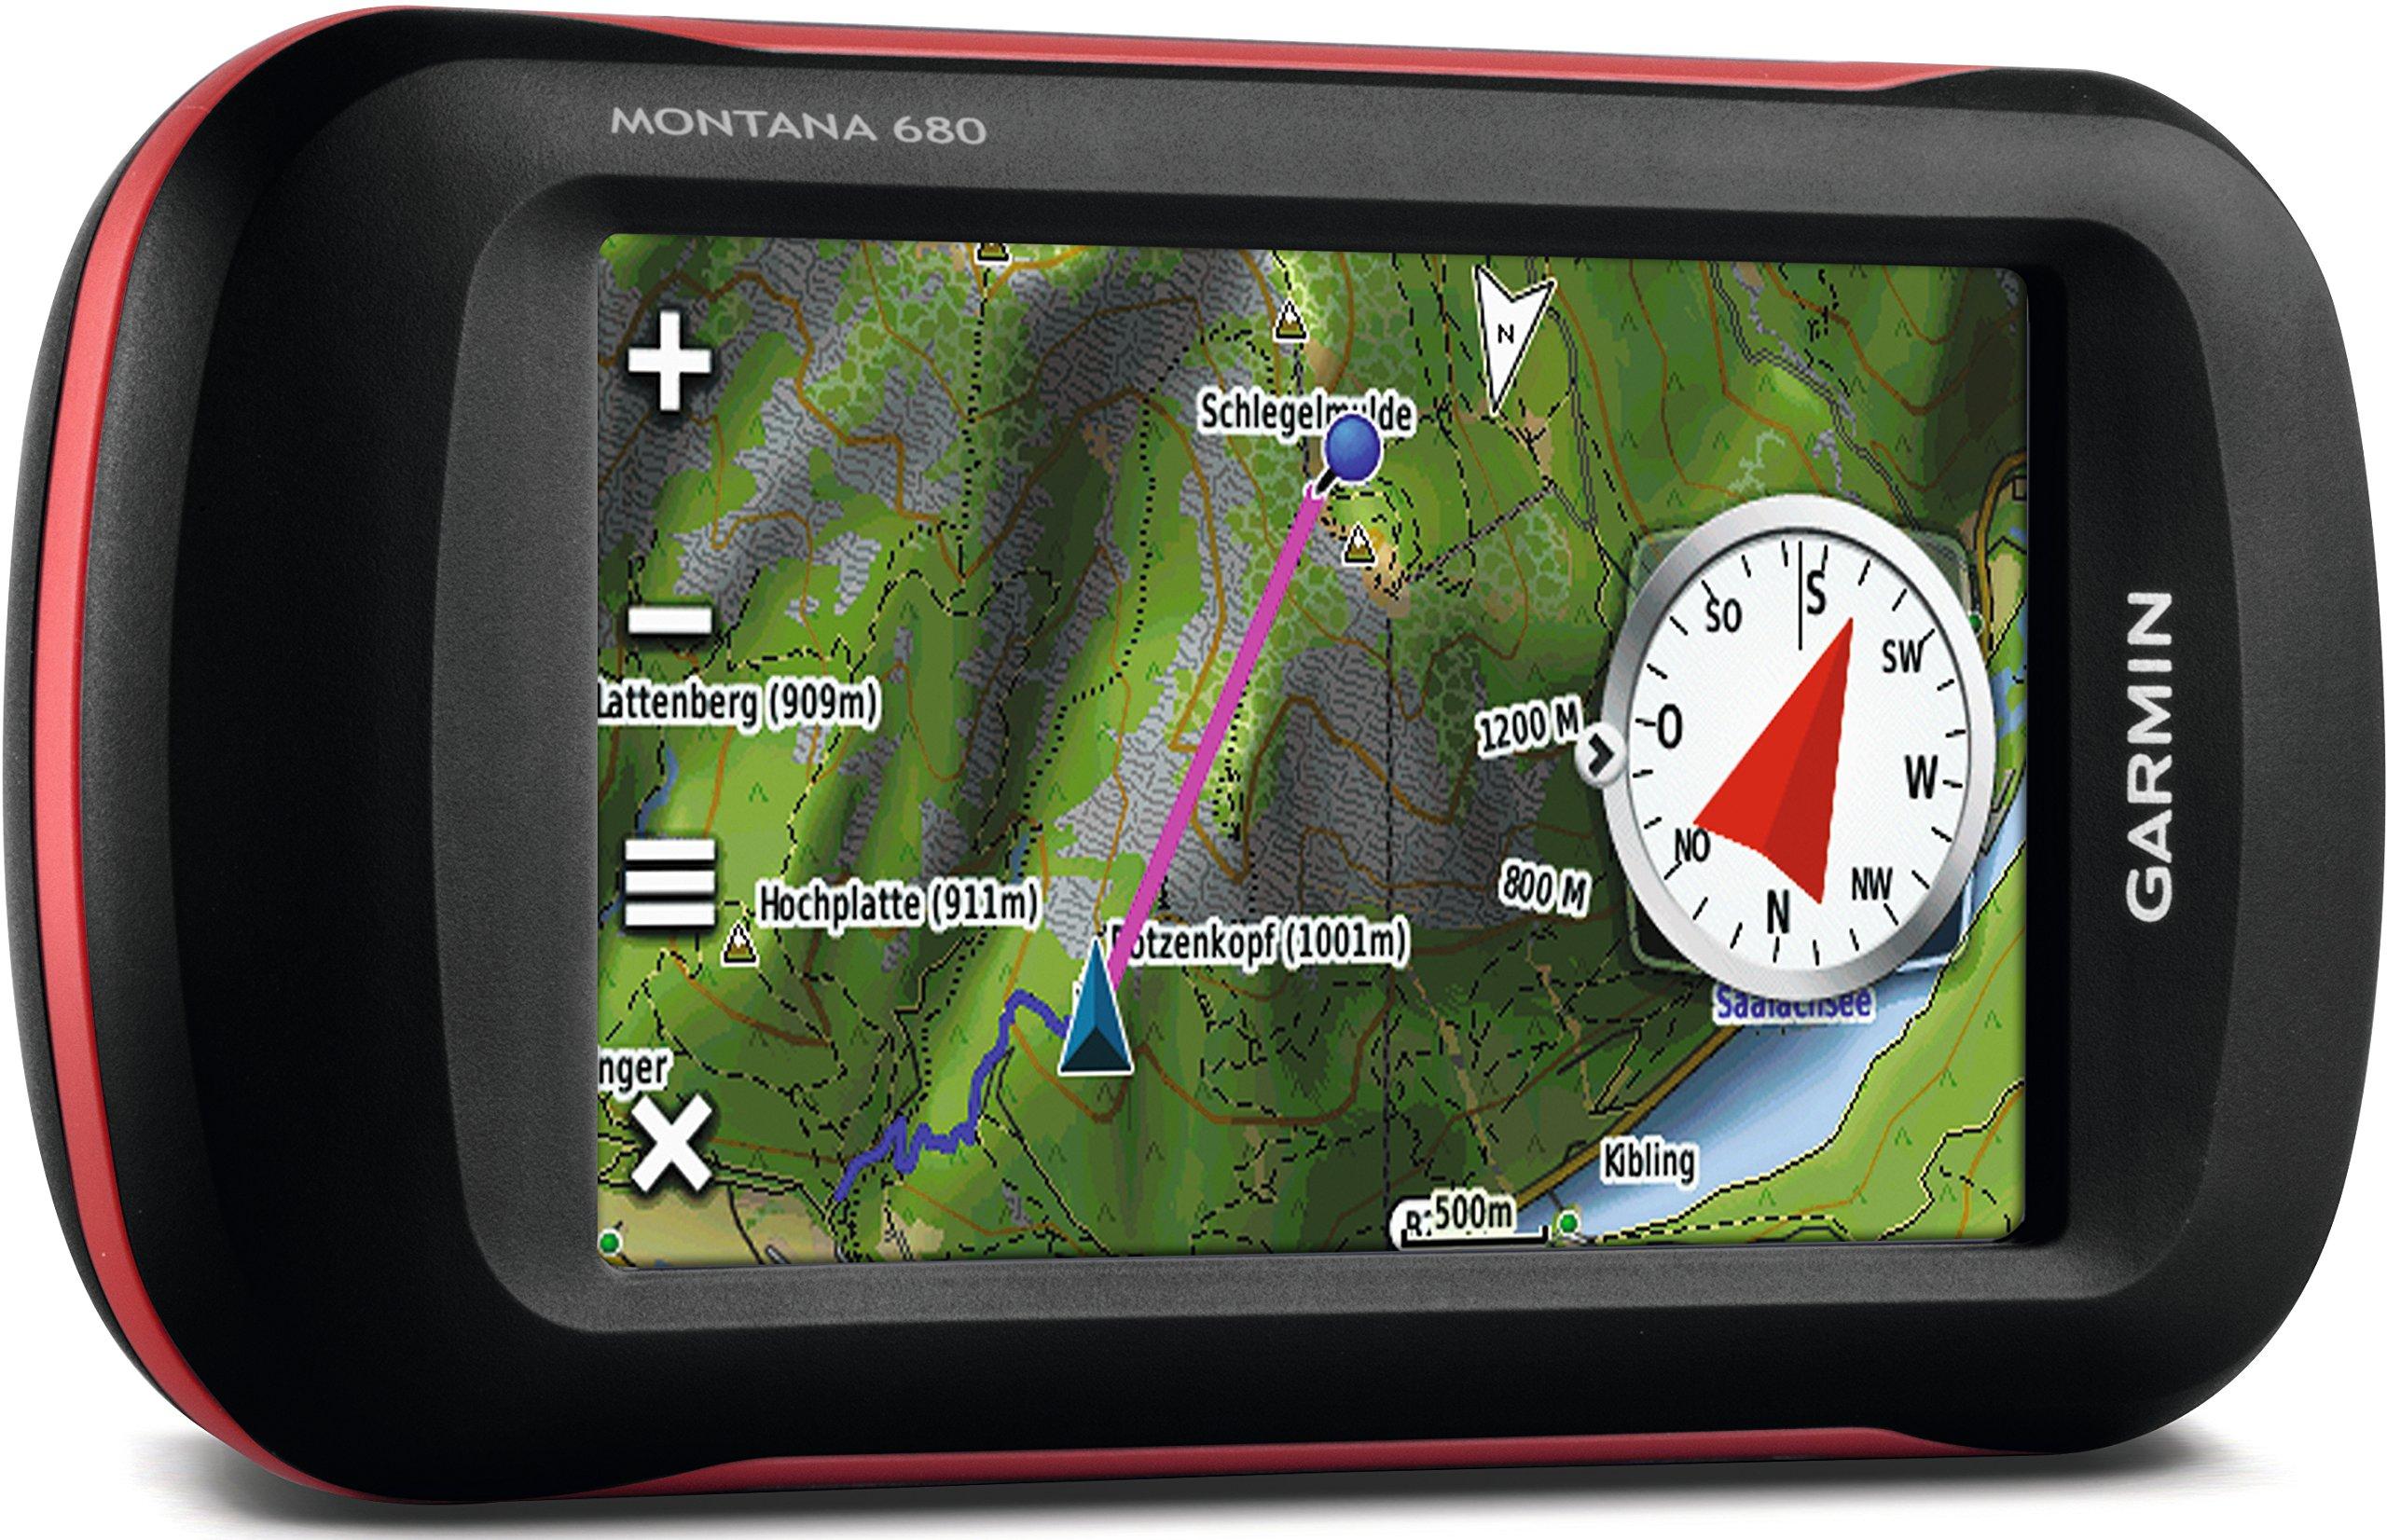 Garmin Montana 680 Touchscreen GPS/GLONASS Receiver, Worldwide Basemaps by Garmin (Image #3)